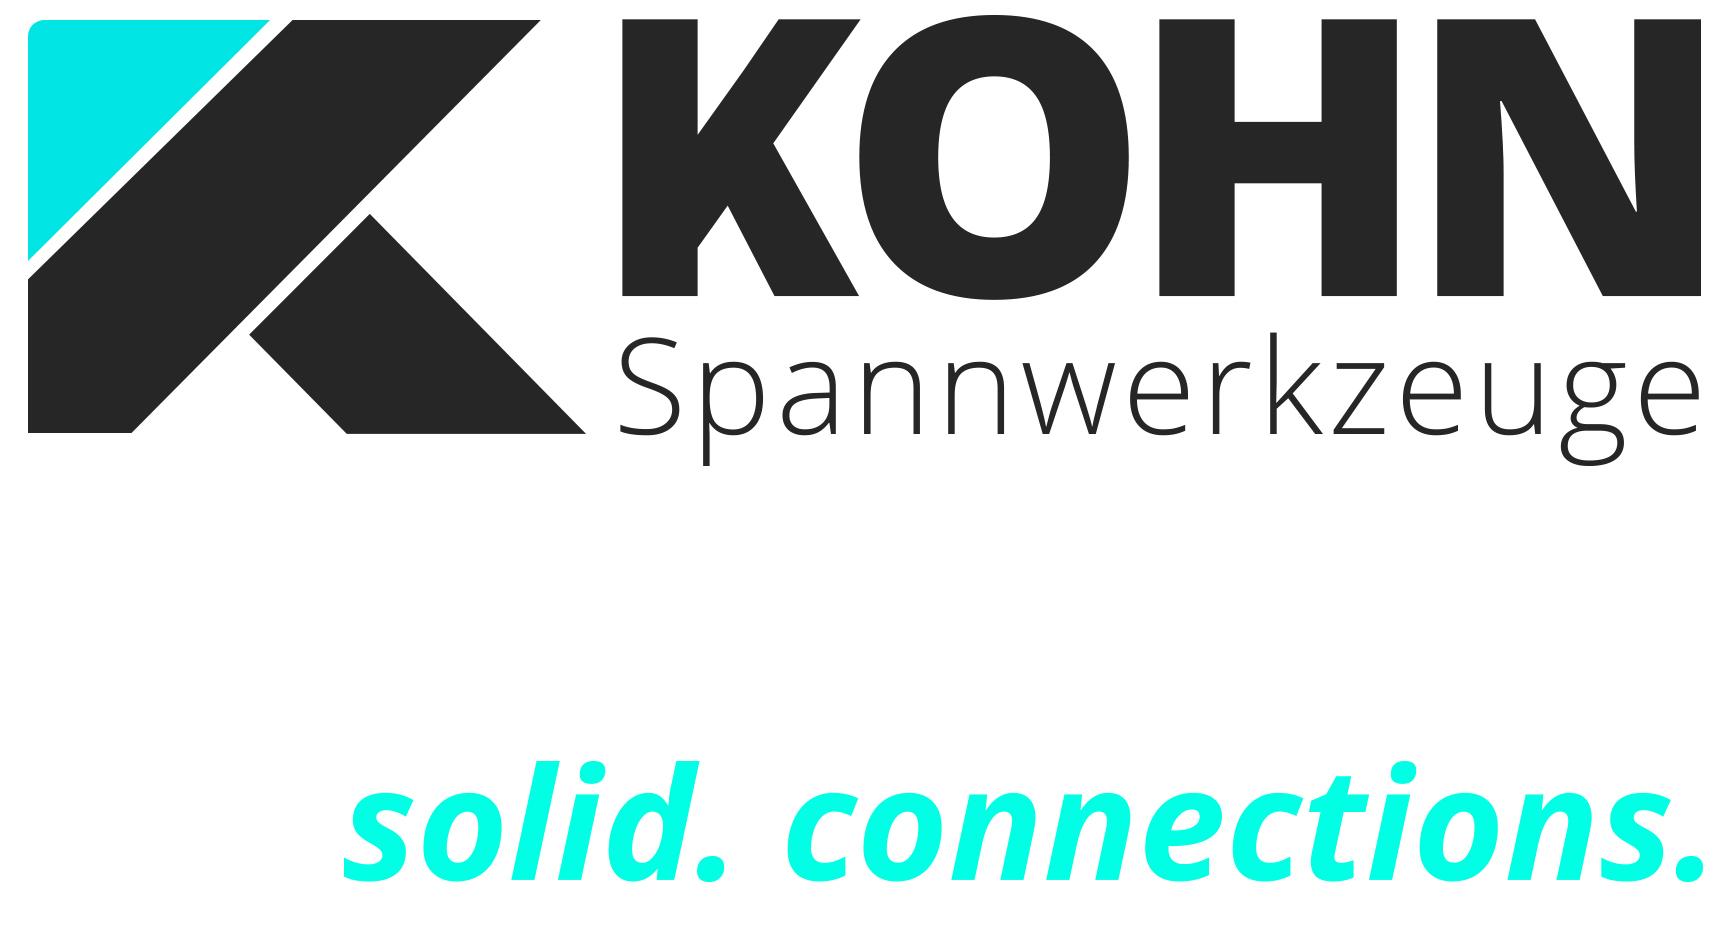 Kohn Spannwerkzeuge GmbH